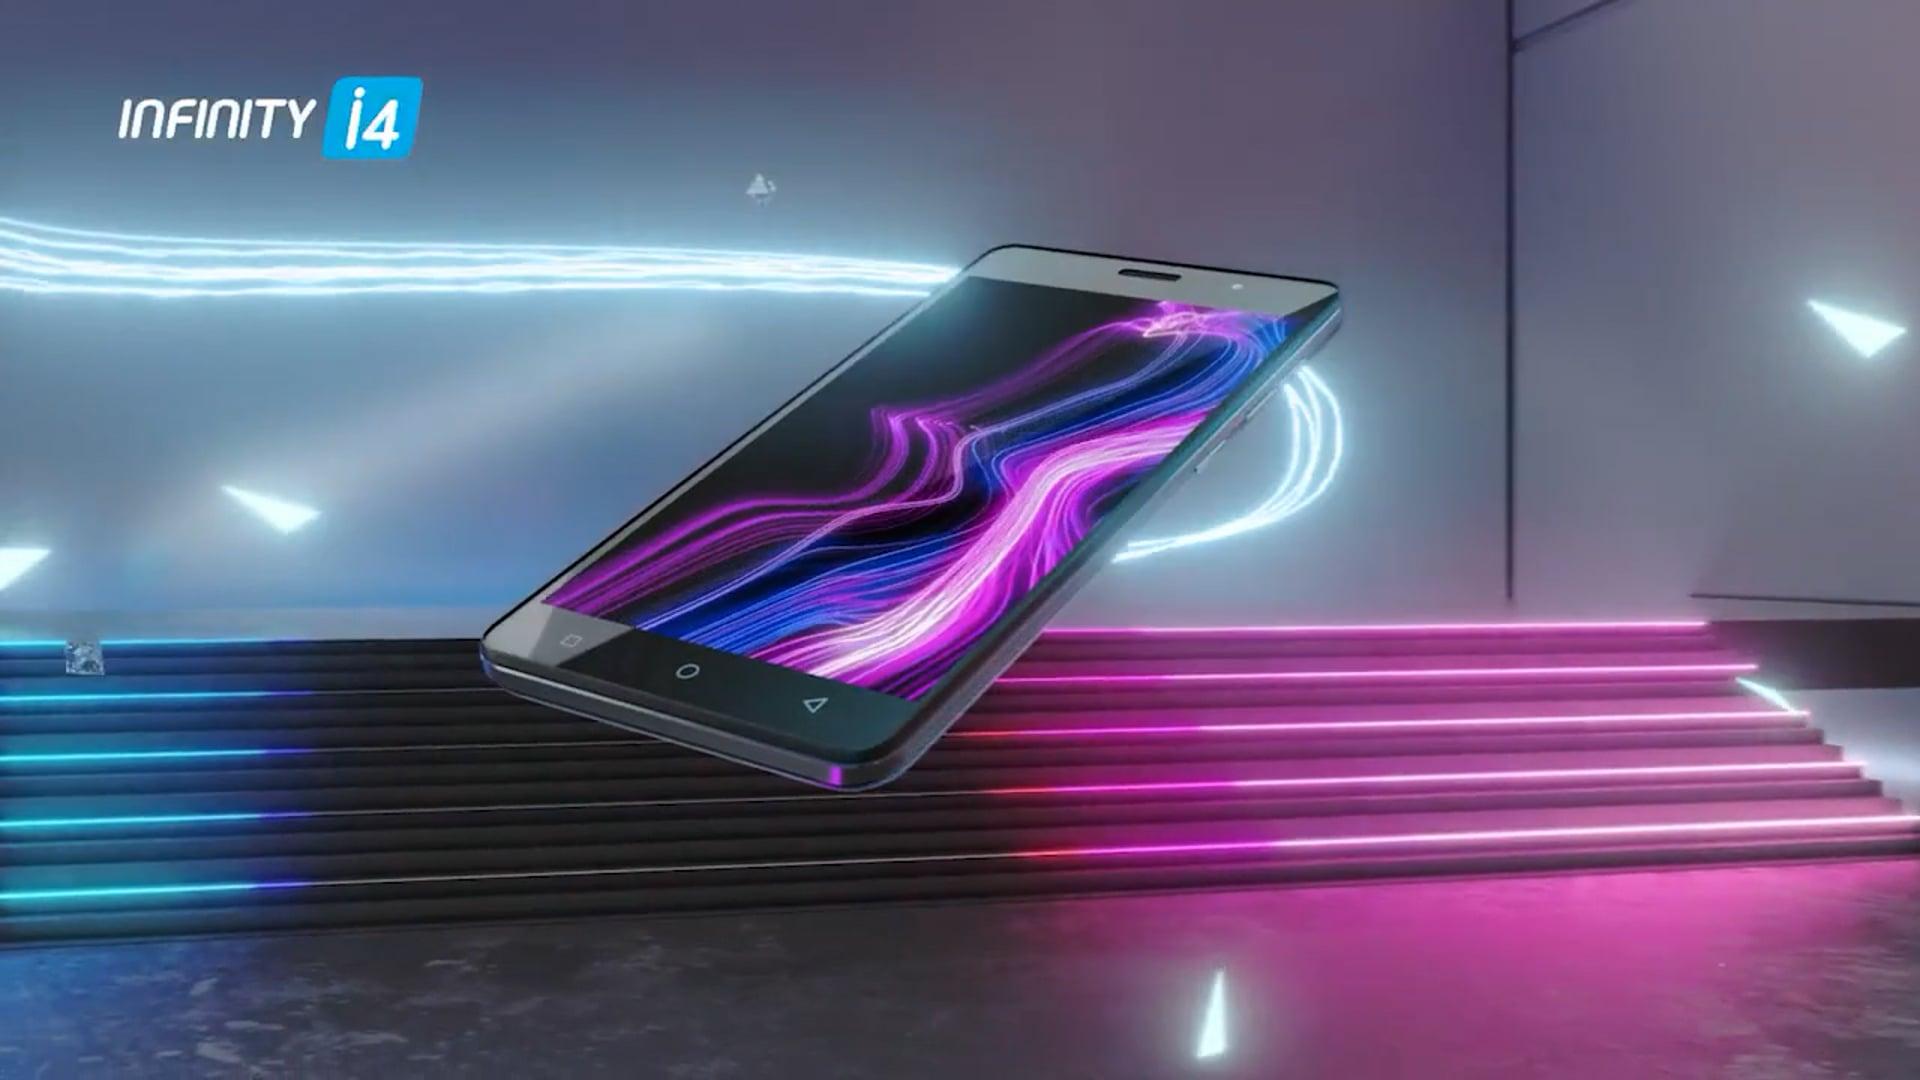 Telenor i4 Infinity